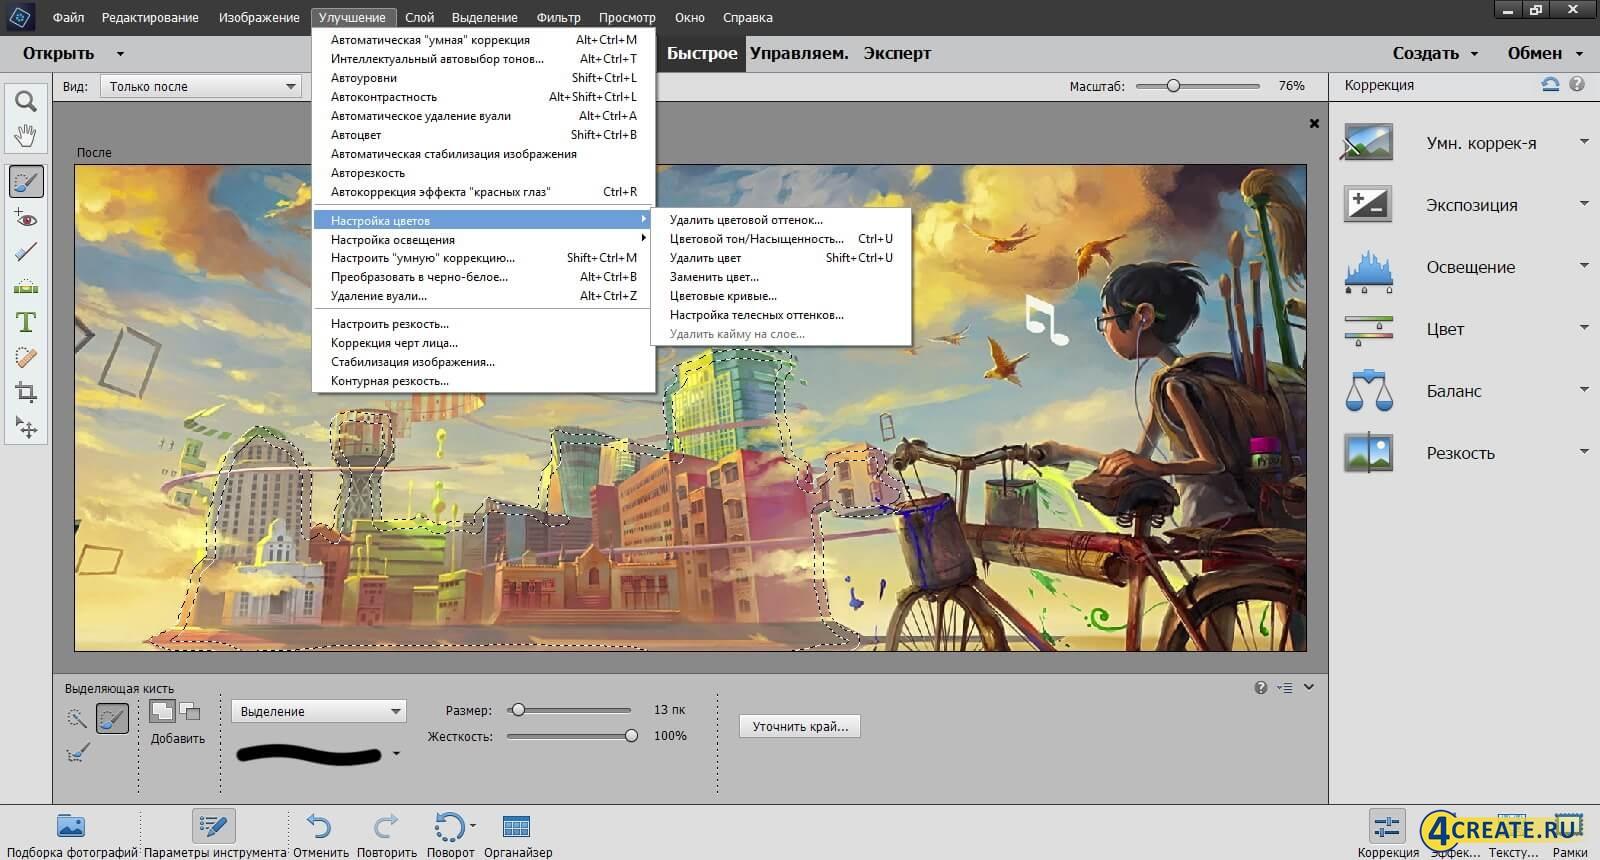 Photoshop Elements 15 (Скриншот 3)